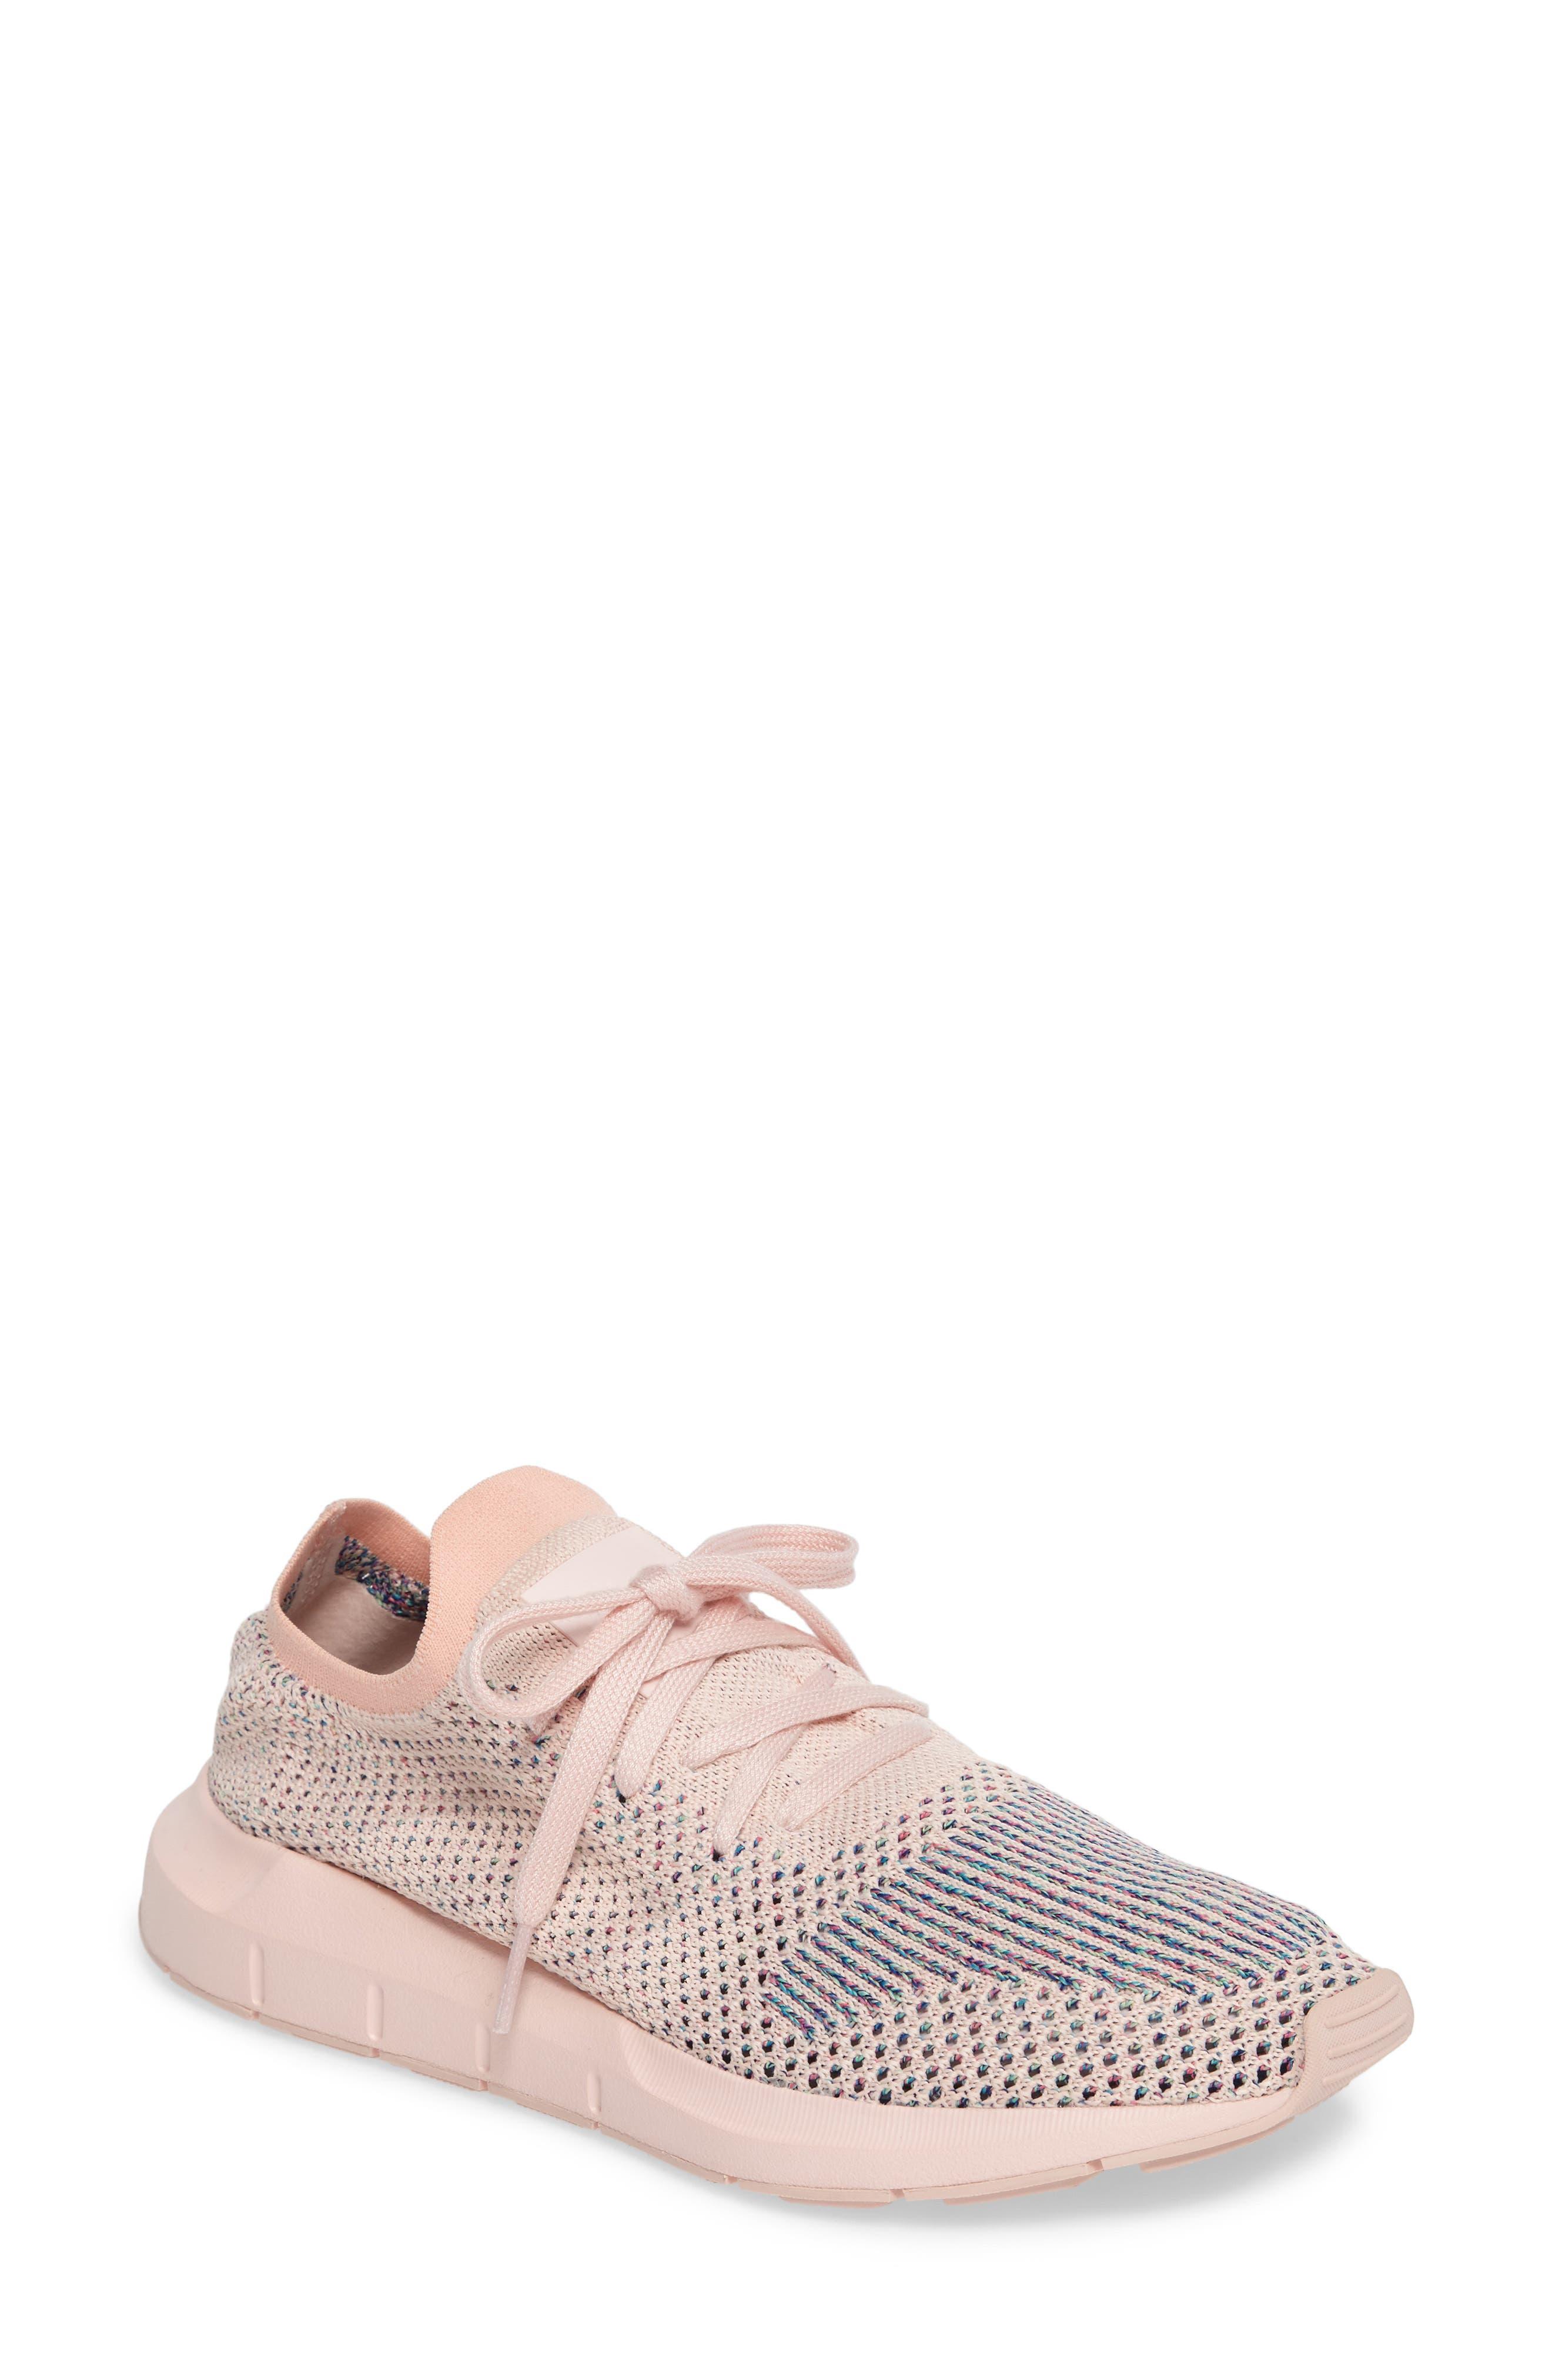 adidas Swift Run Primeknit Training Shoe (Women)